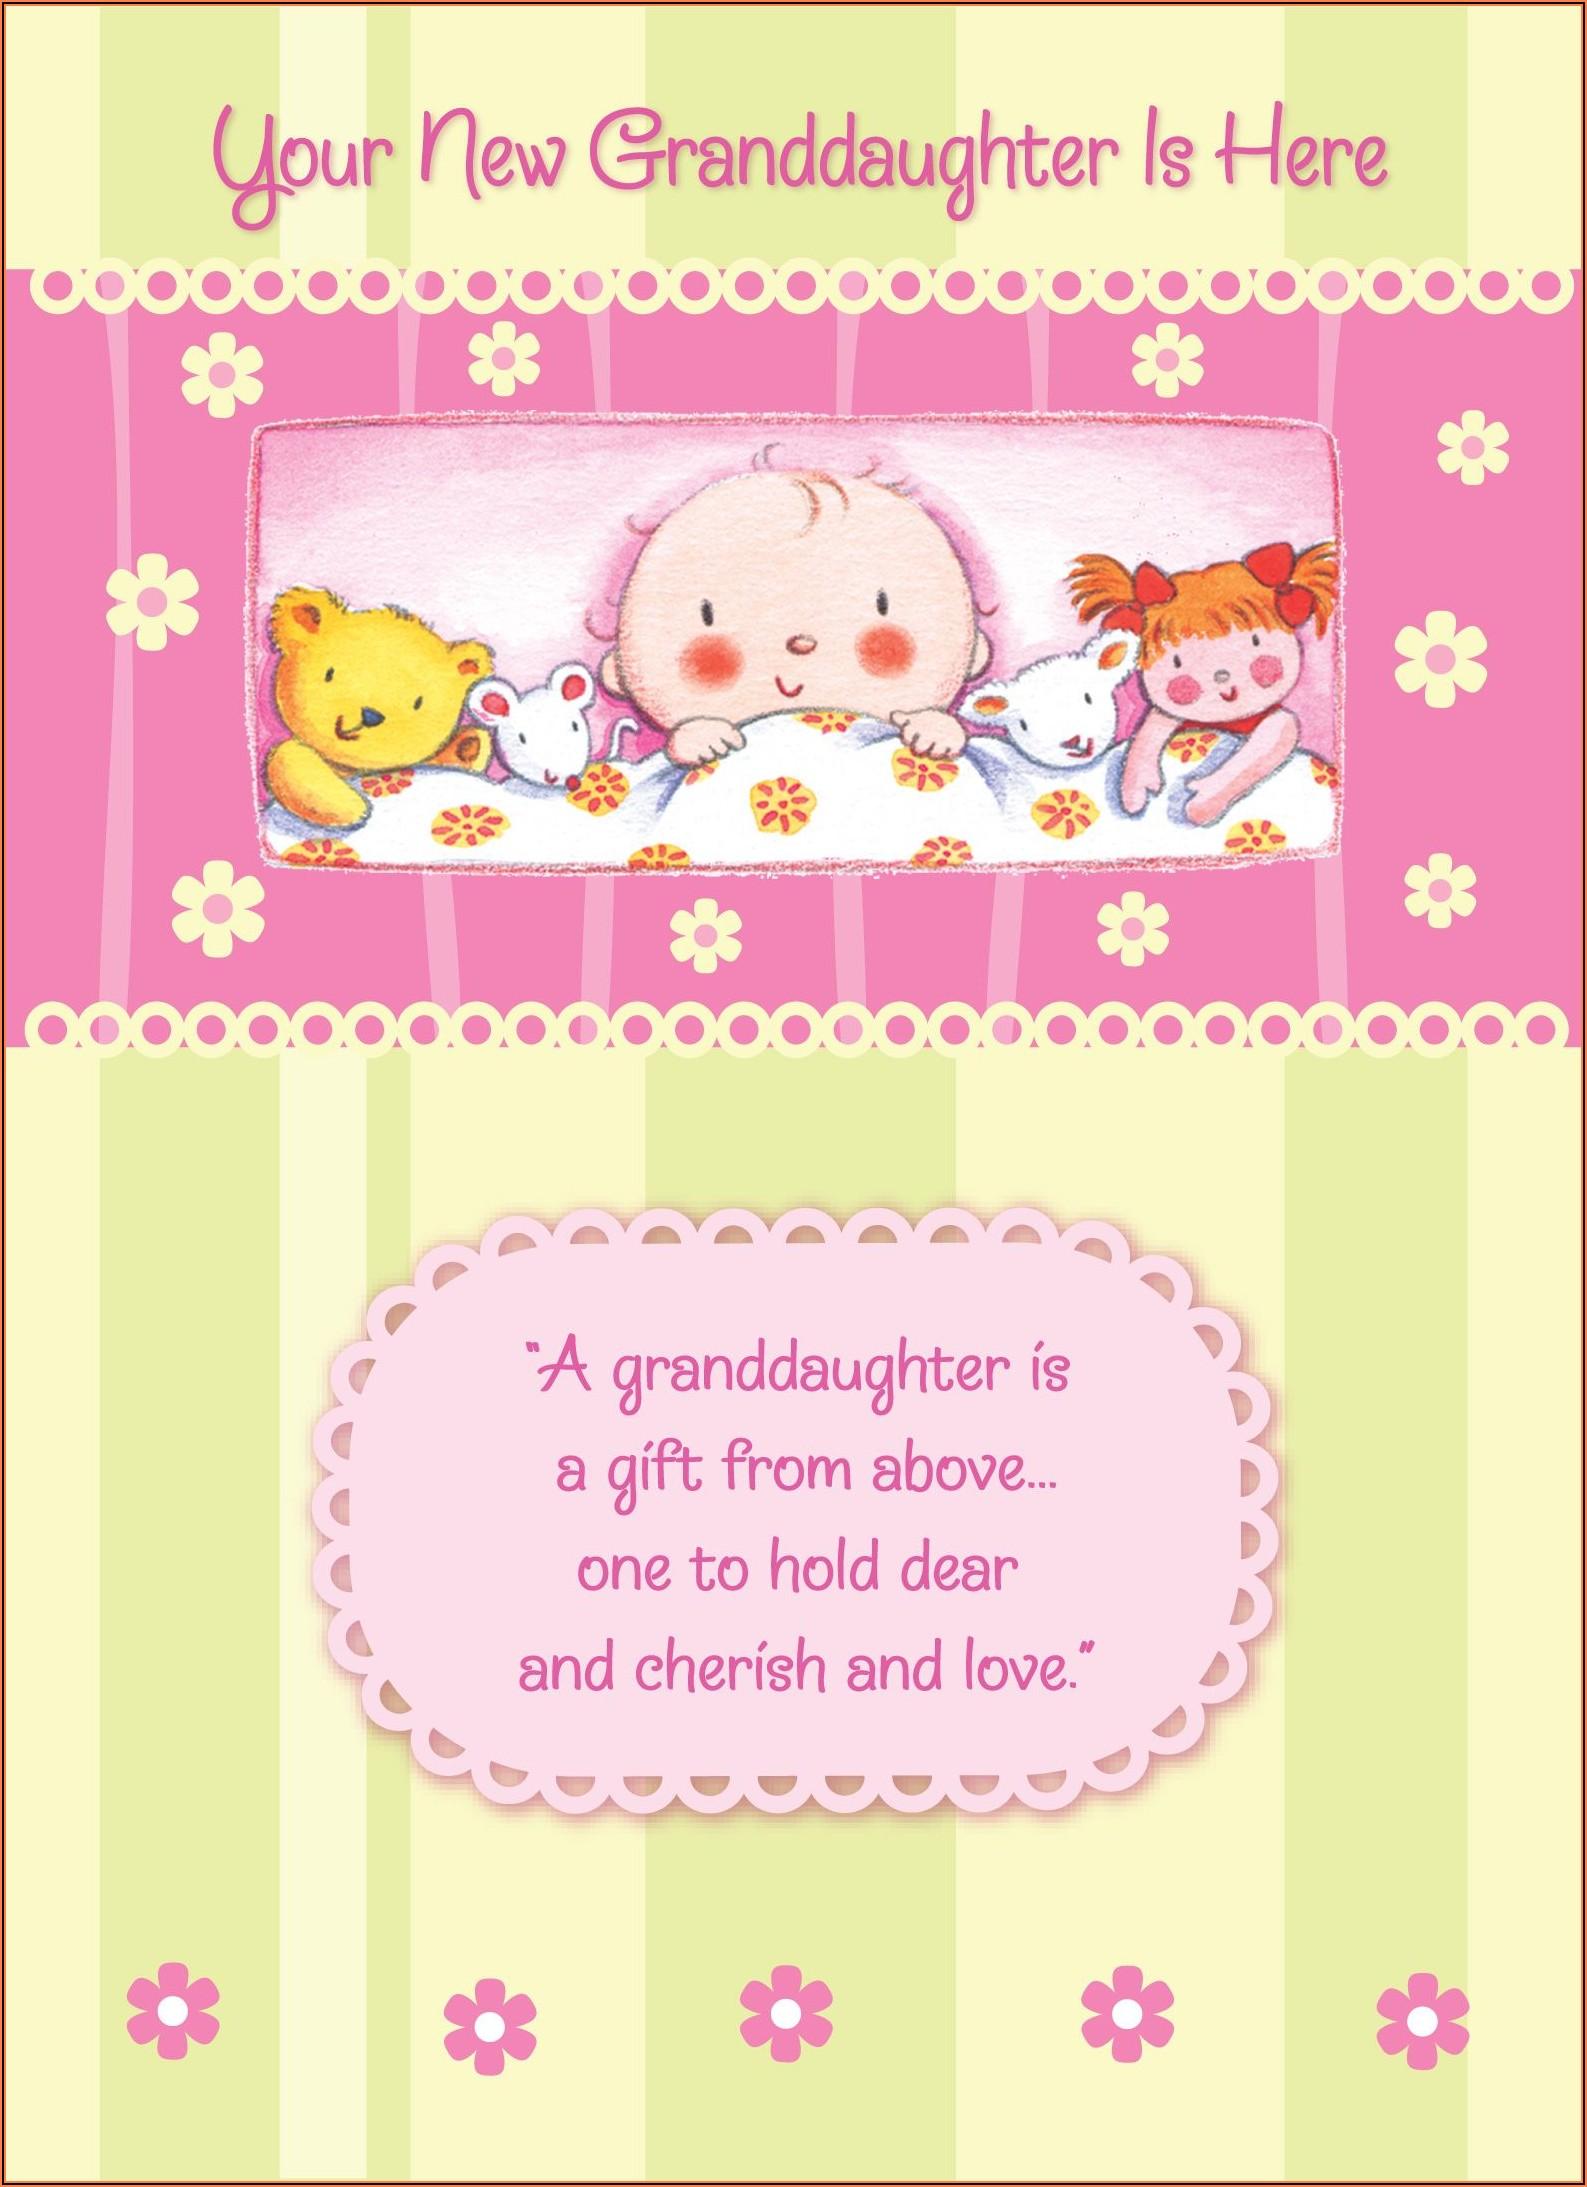 Granddaughter Birth Announcement Wording